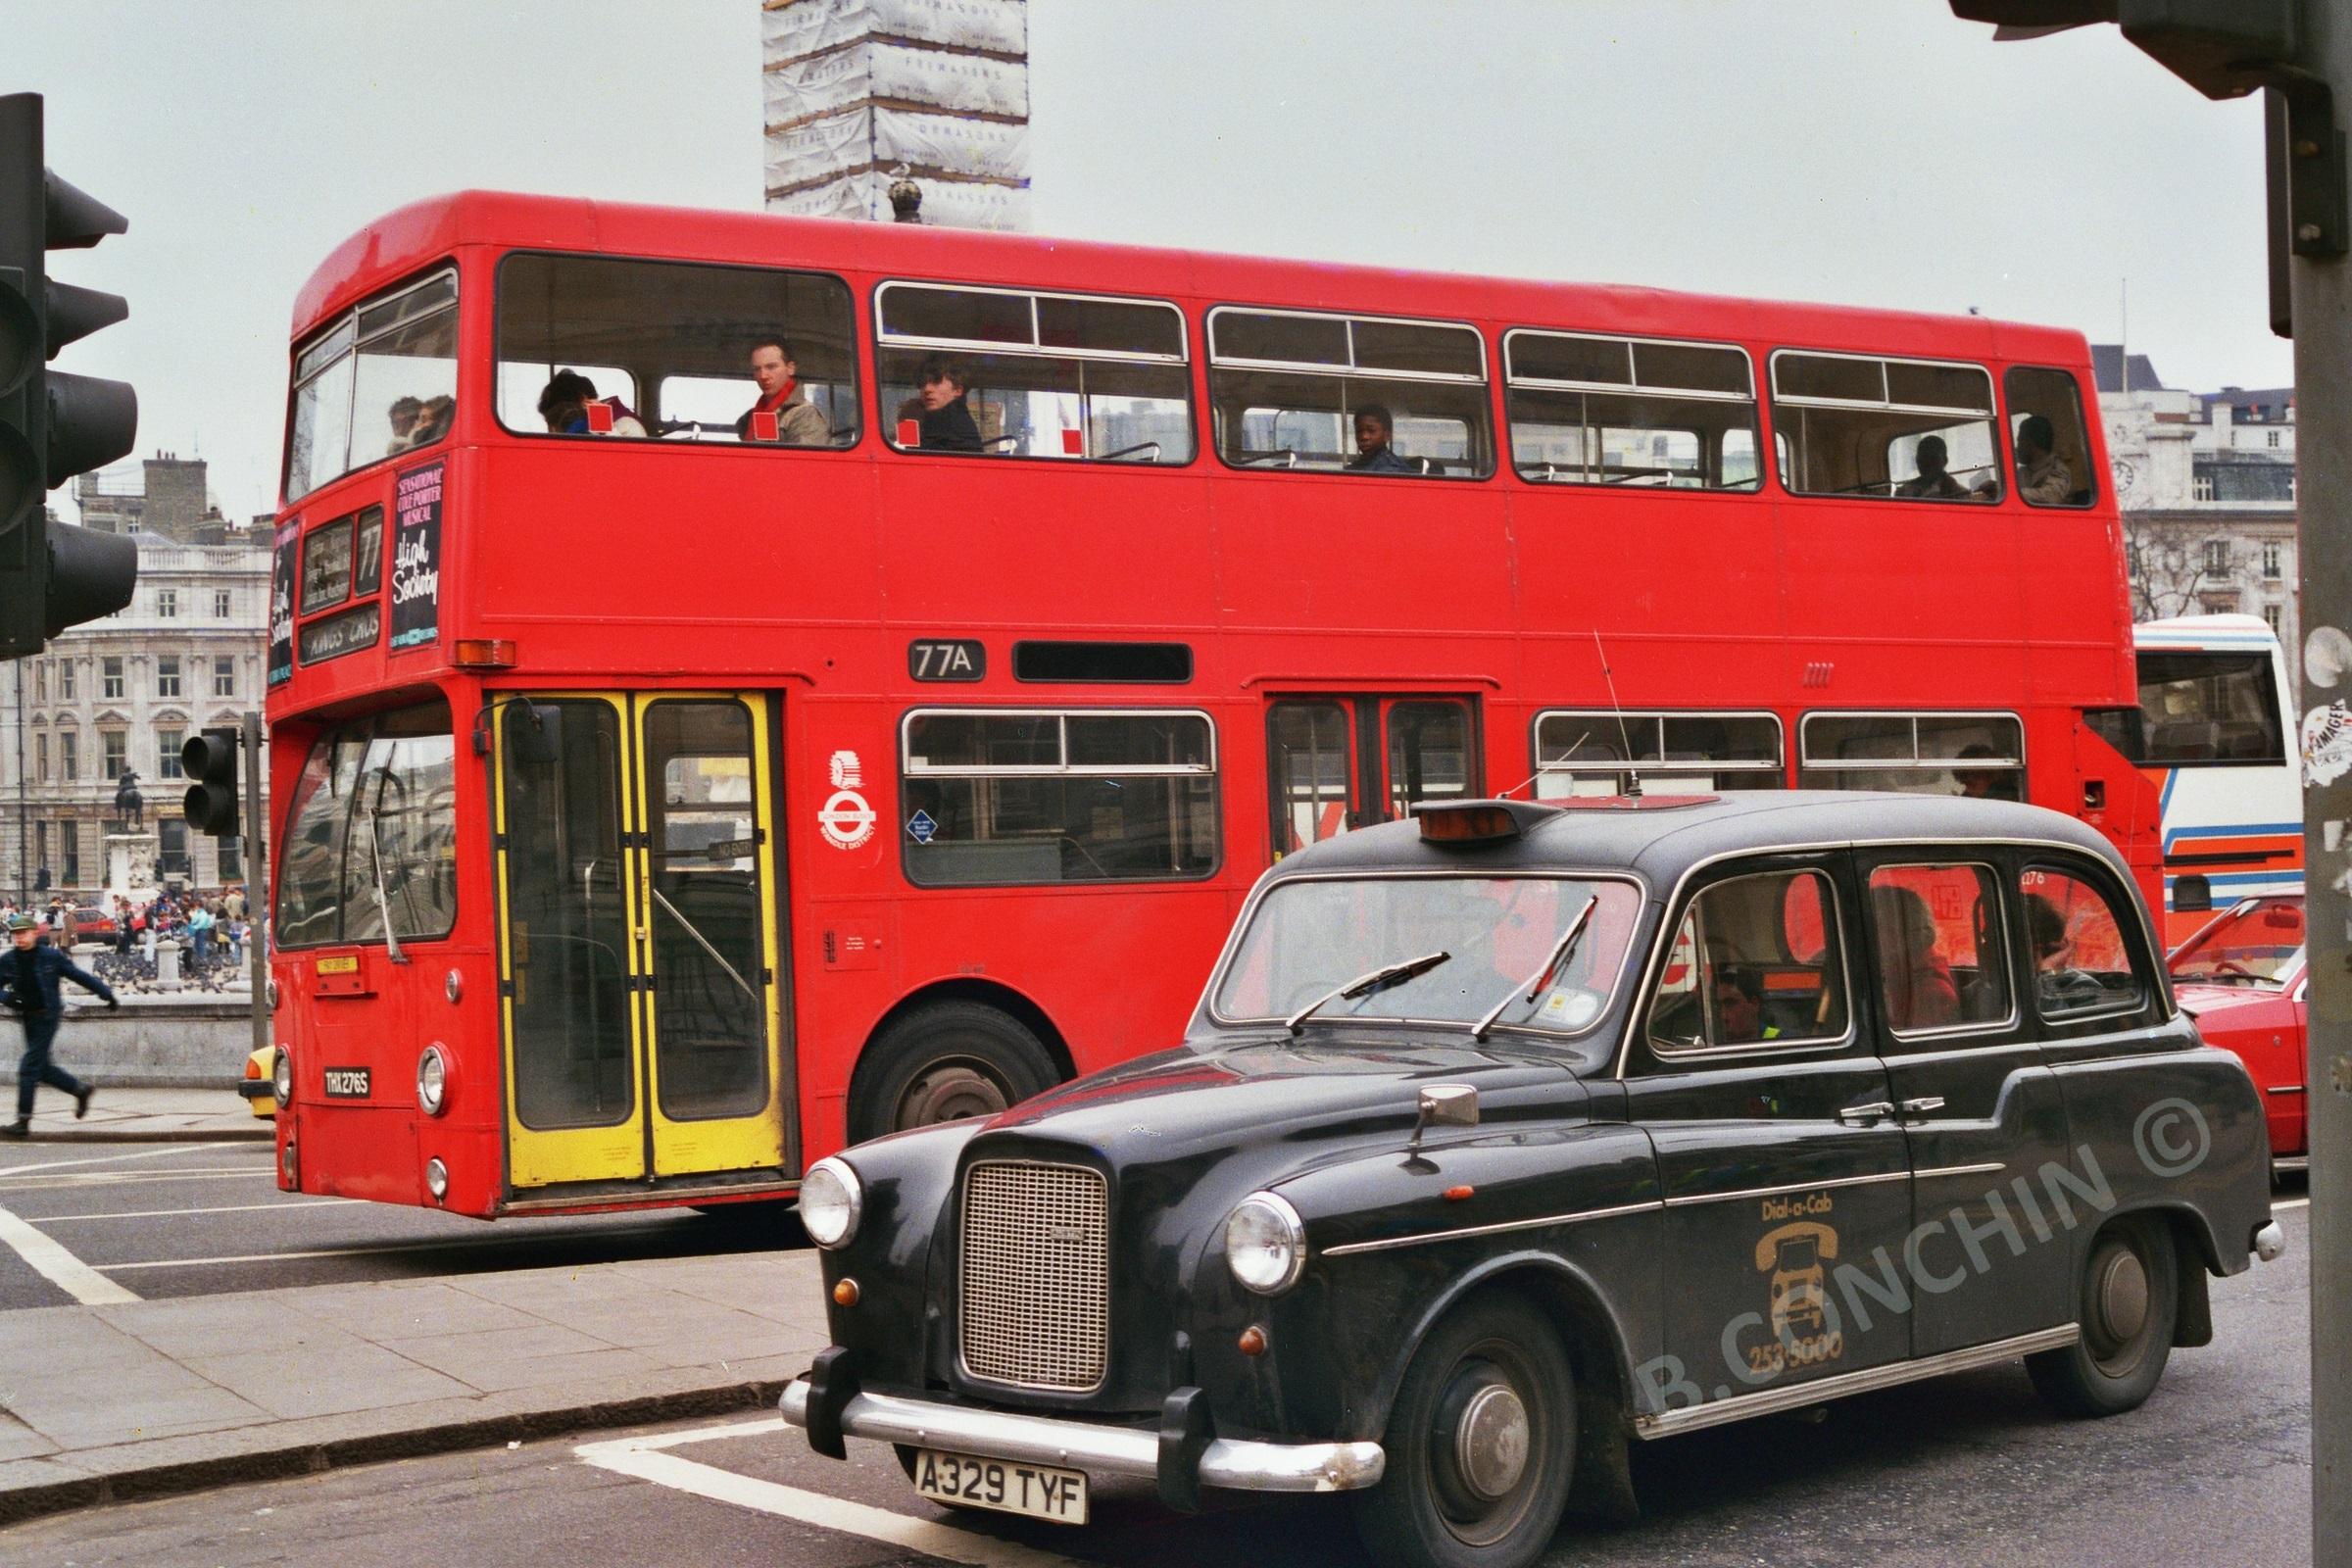 Transports londoniens